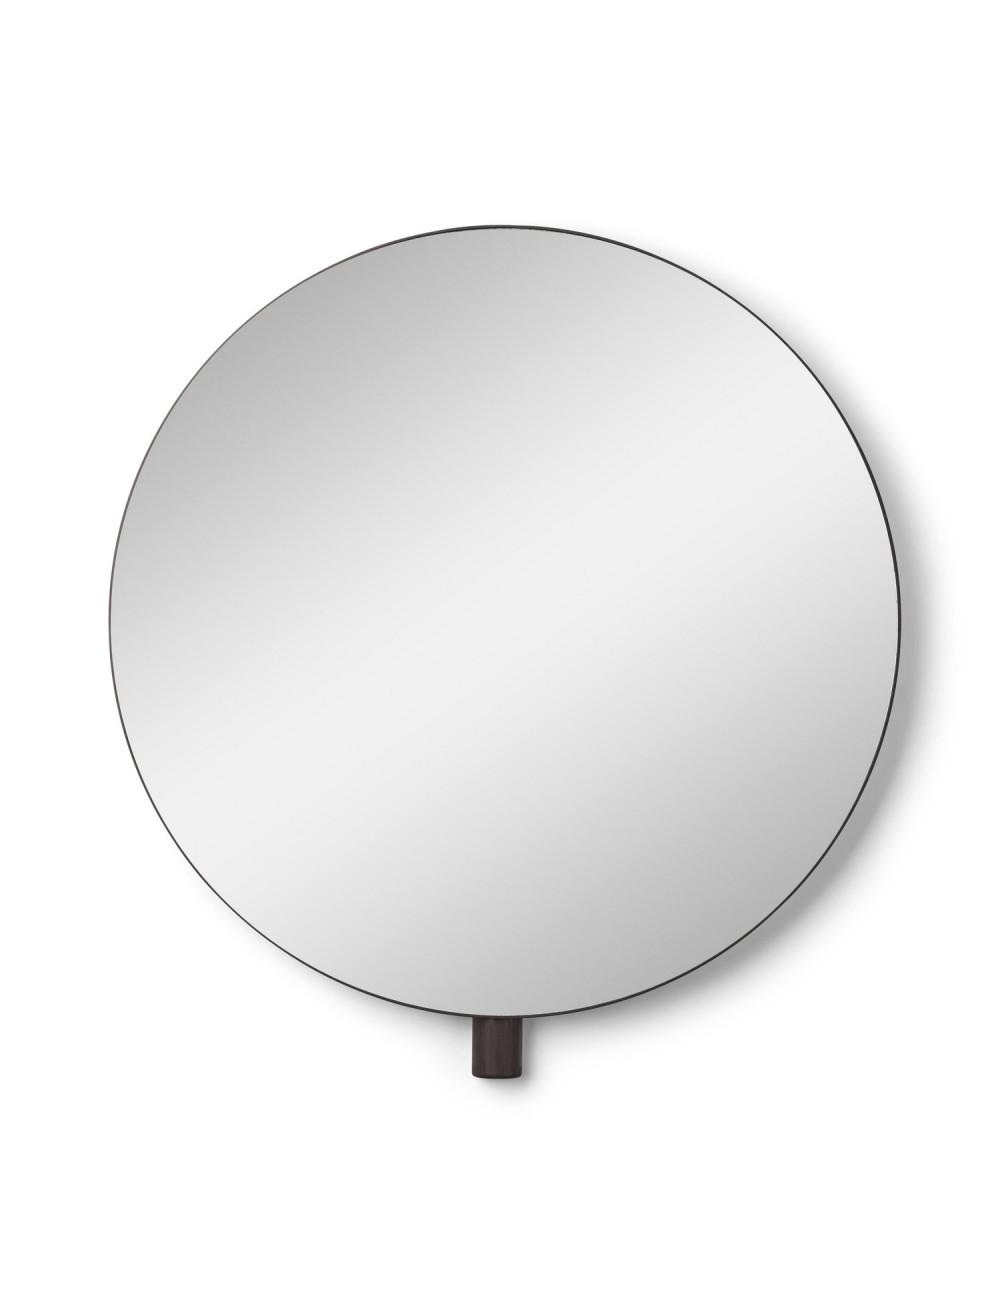 Ronde spiegel Kollage